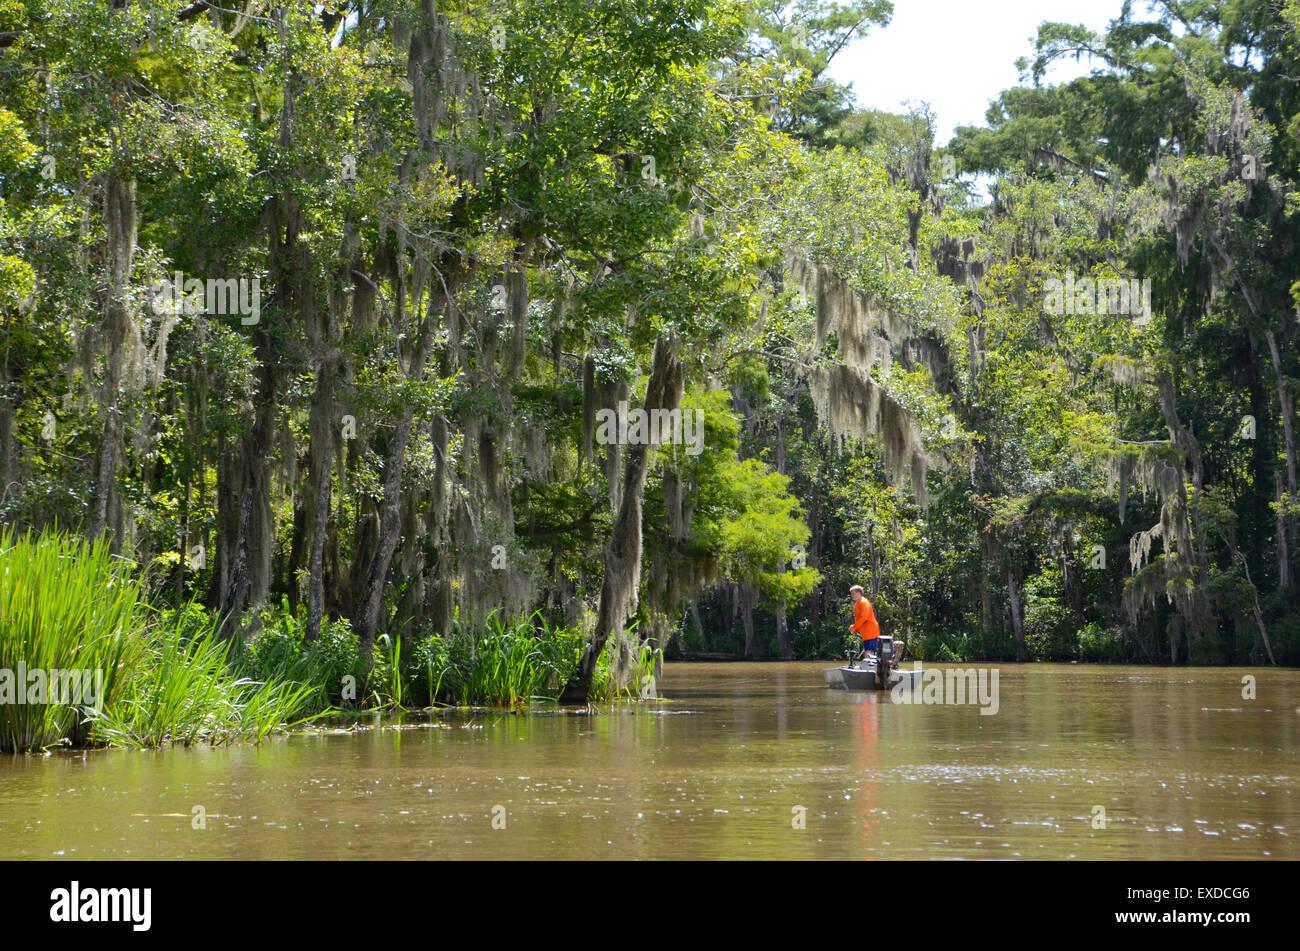 fisherman pearl river swamp new orleans - Stock Image